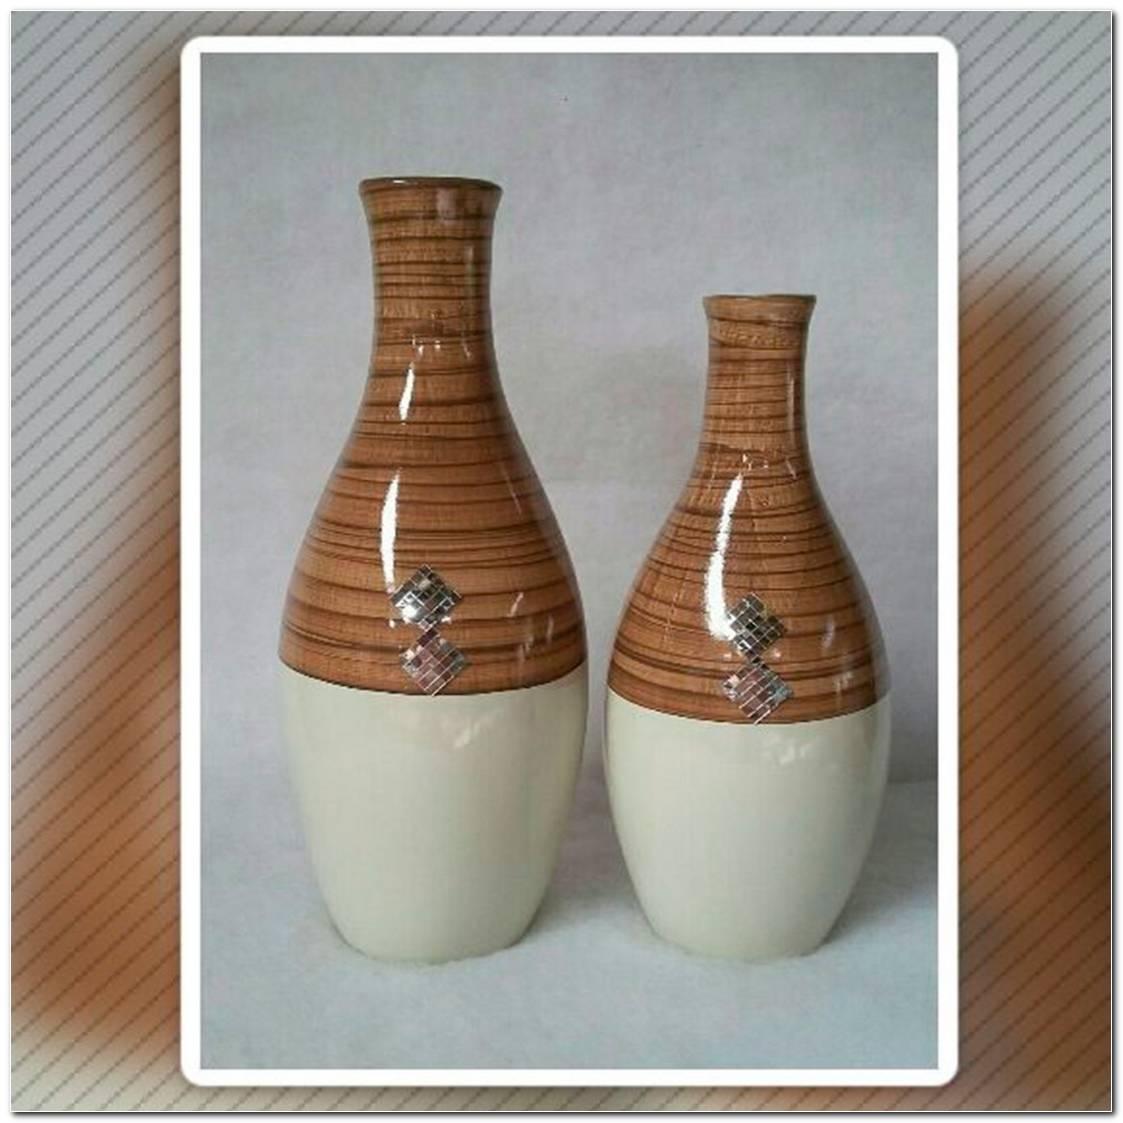 Vasos Para Decora%C3%A7%C3%A3o De Sala